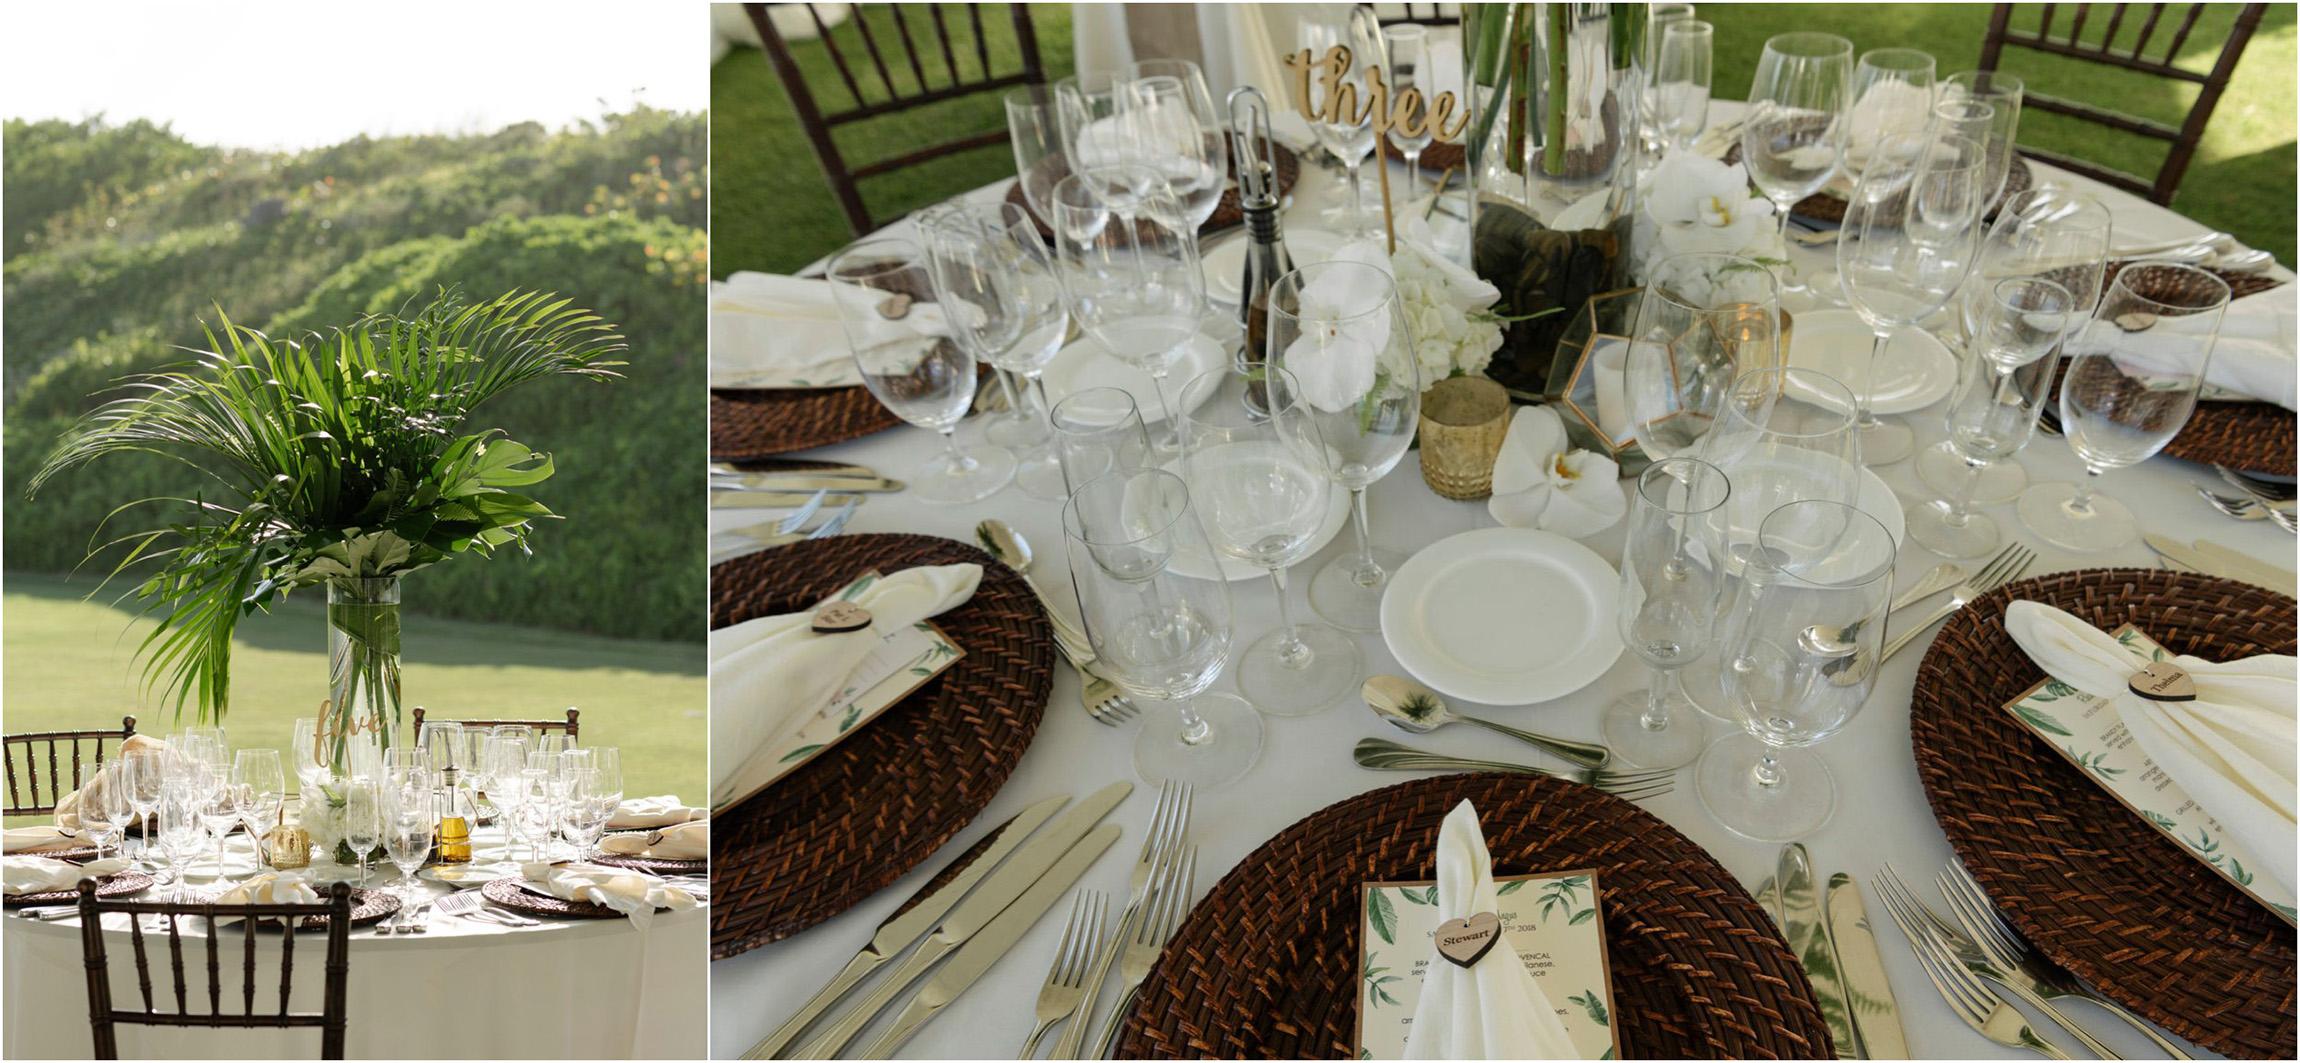 ©FianderFoto_Bermuda Wedding Photographer_Mid Ocean_Rachel_Angus_084.jpg